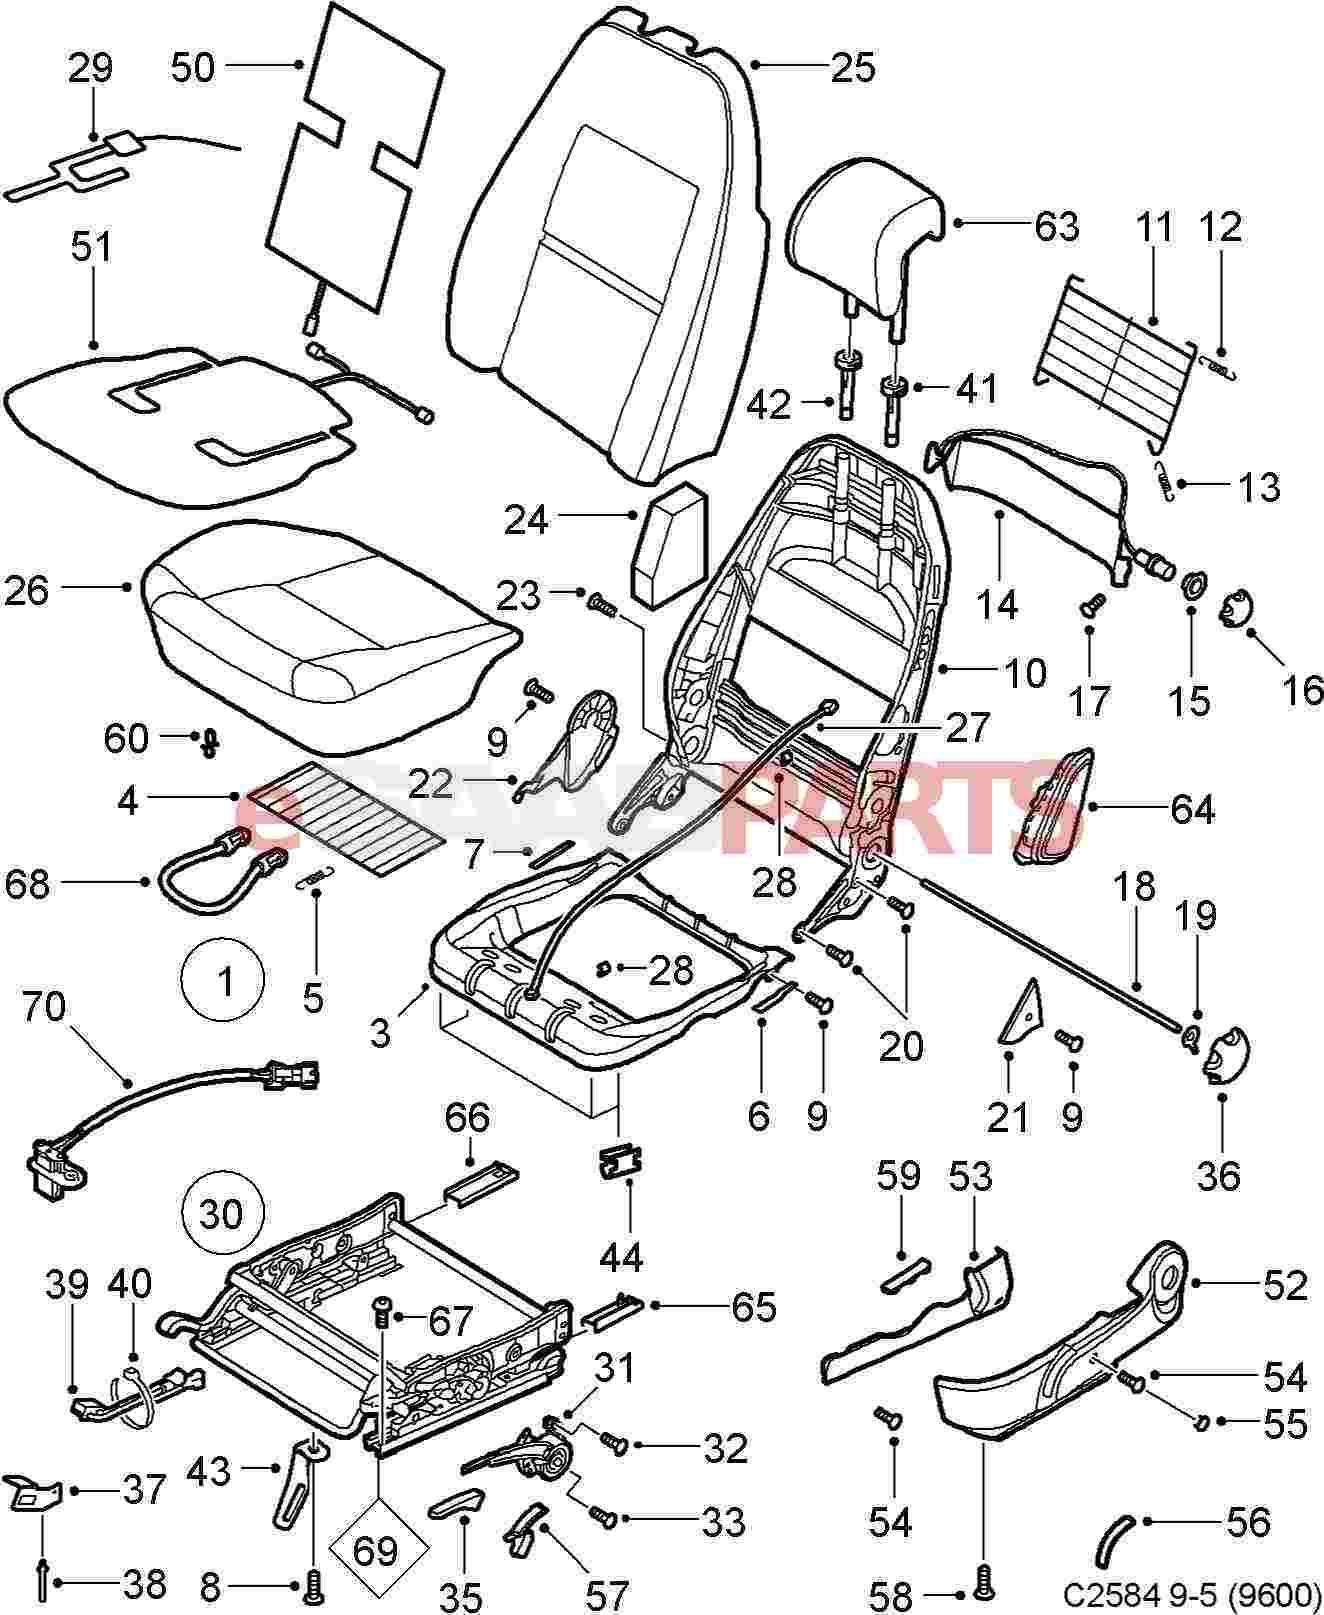 Outdrive Trim Pump Wiring Diagrams Not Lossing Diagram Mercruiser Power Imageresizertool Com Mercury Outboard Tilt